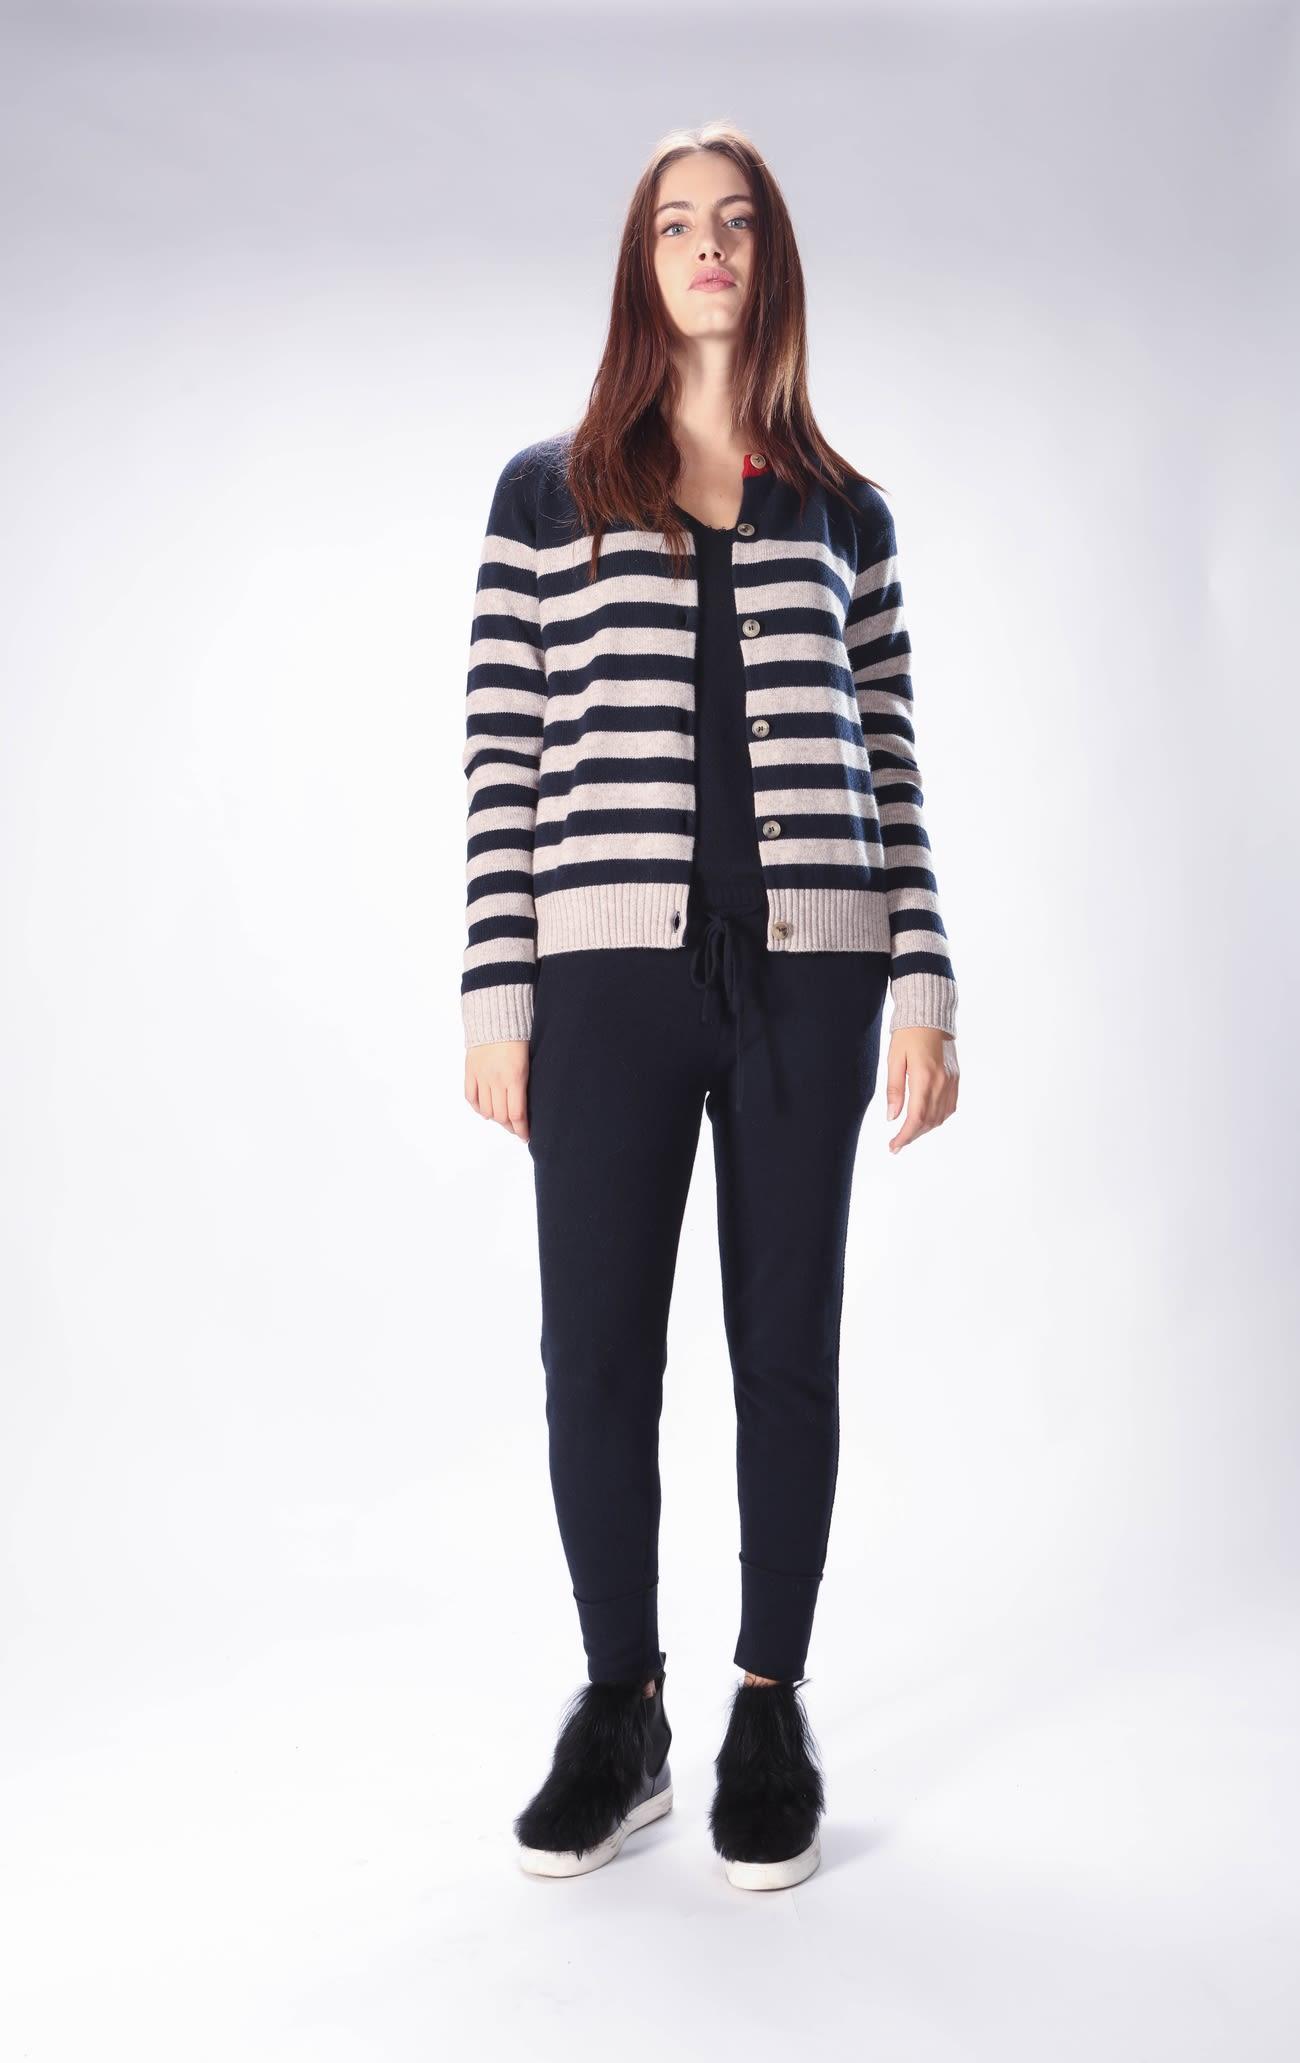 ALTALANA Sweater in Righ